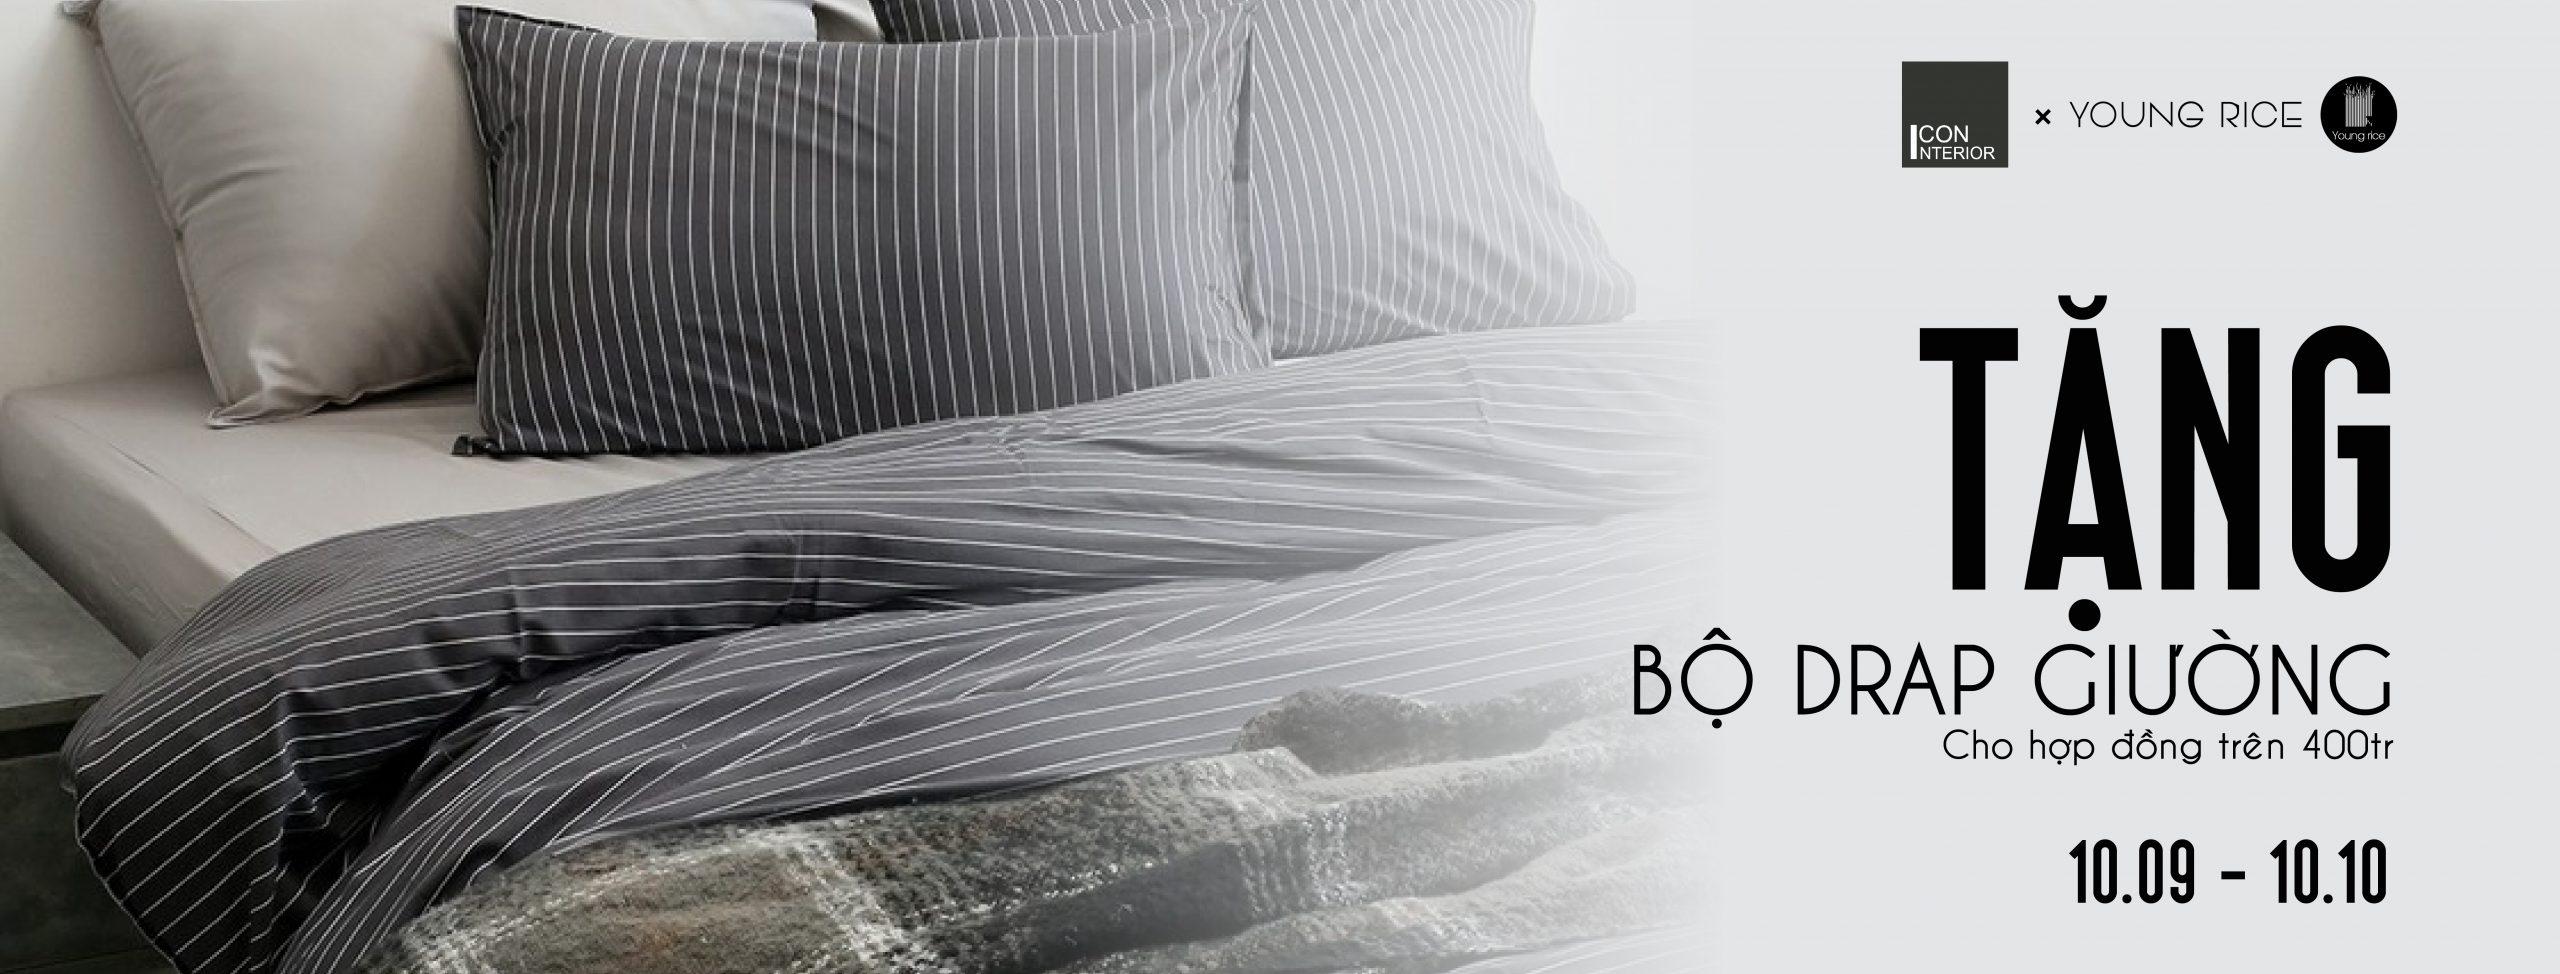 Tặng drap giường